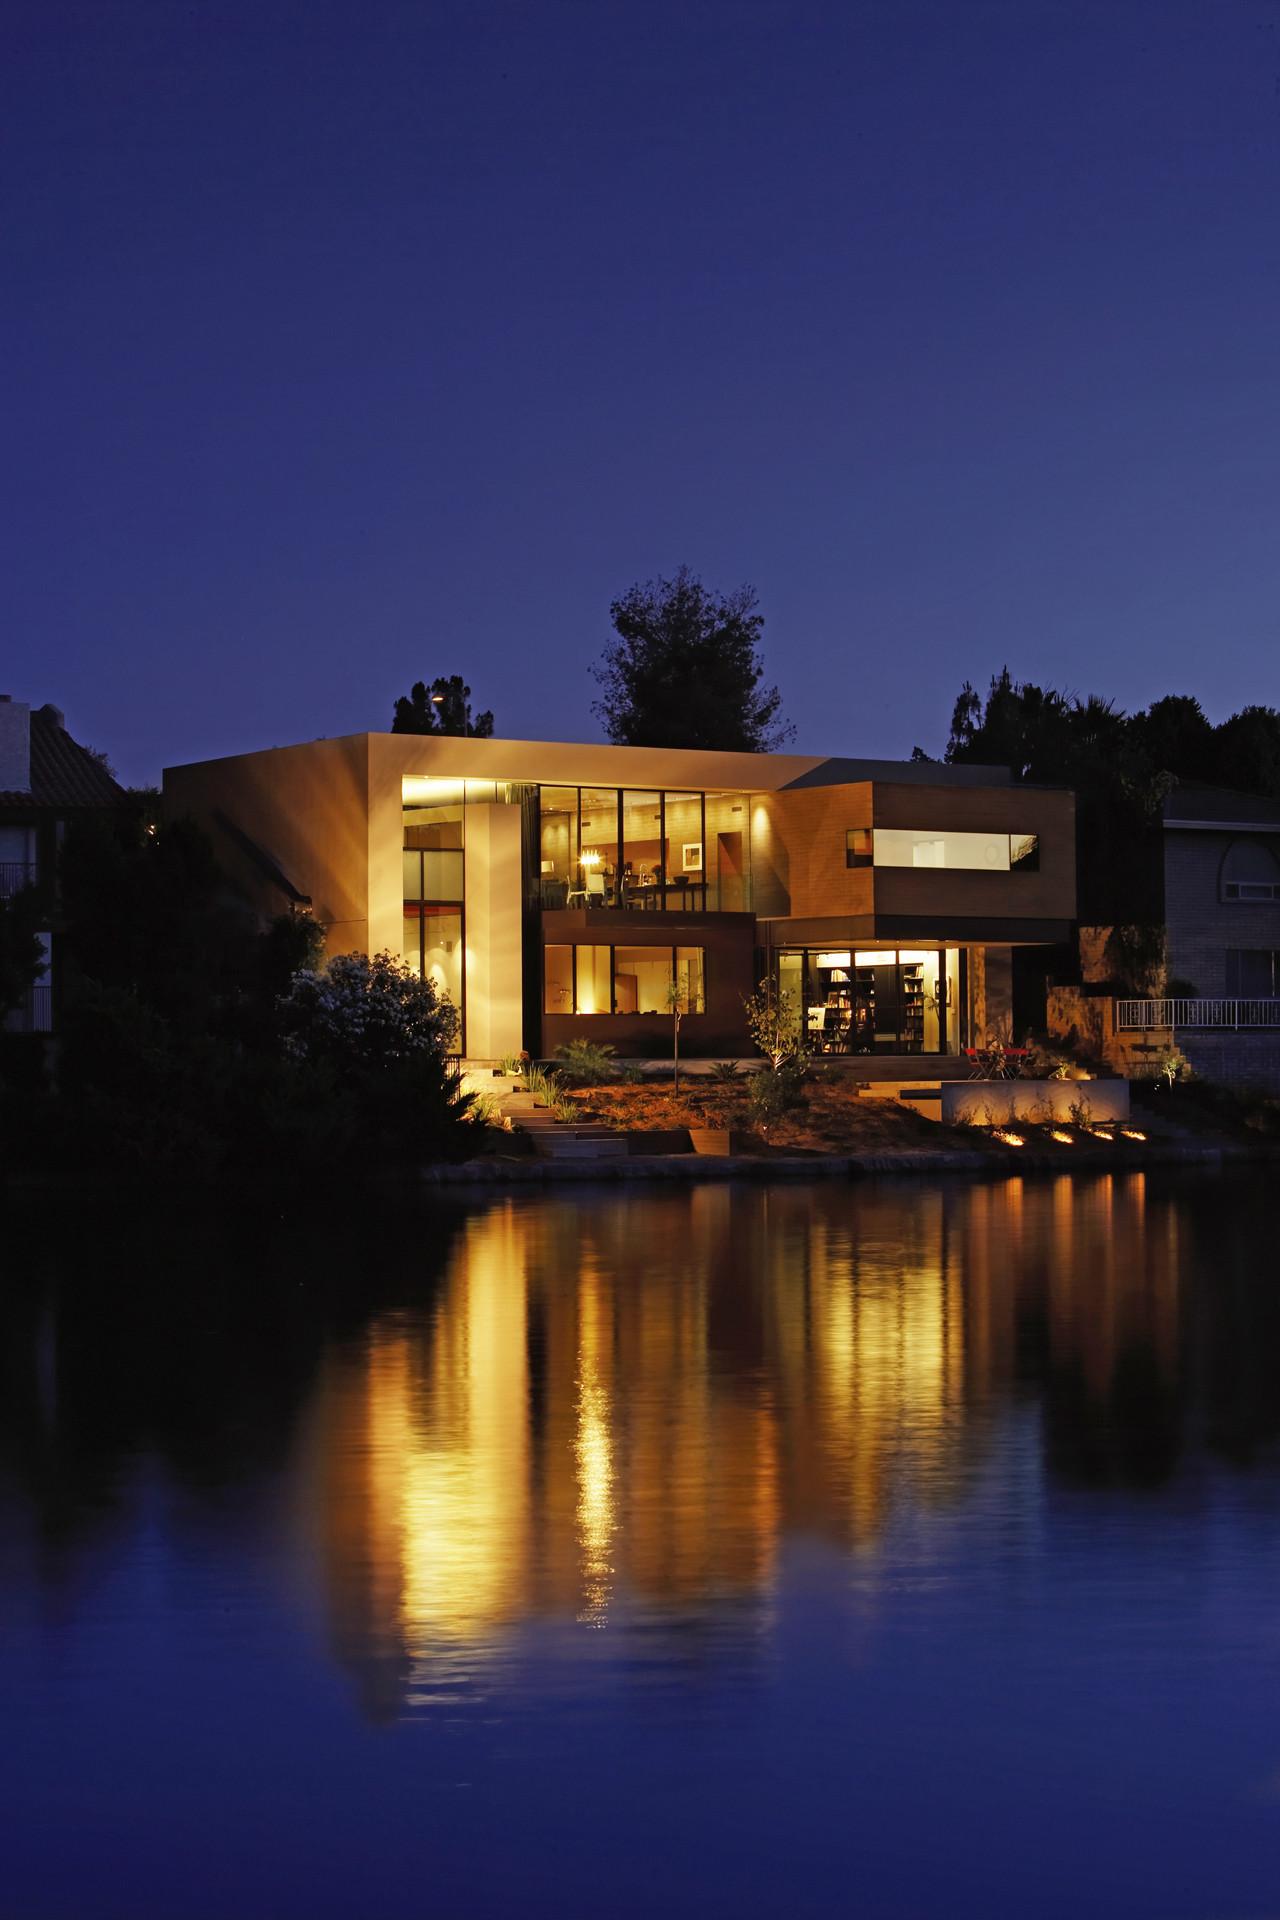 The Lake Residence By Architekton In Arizona Design